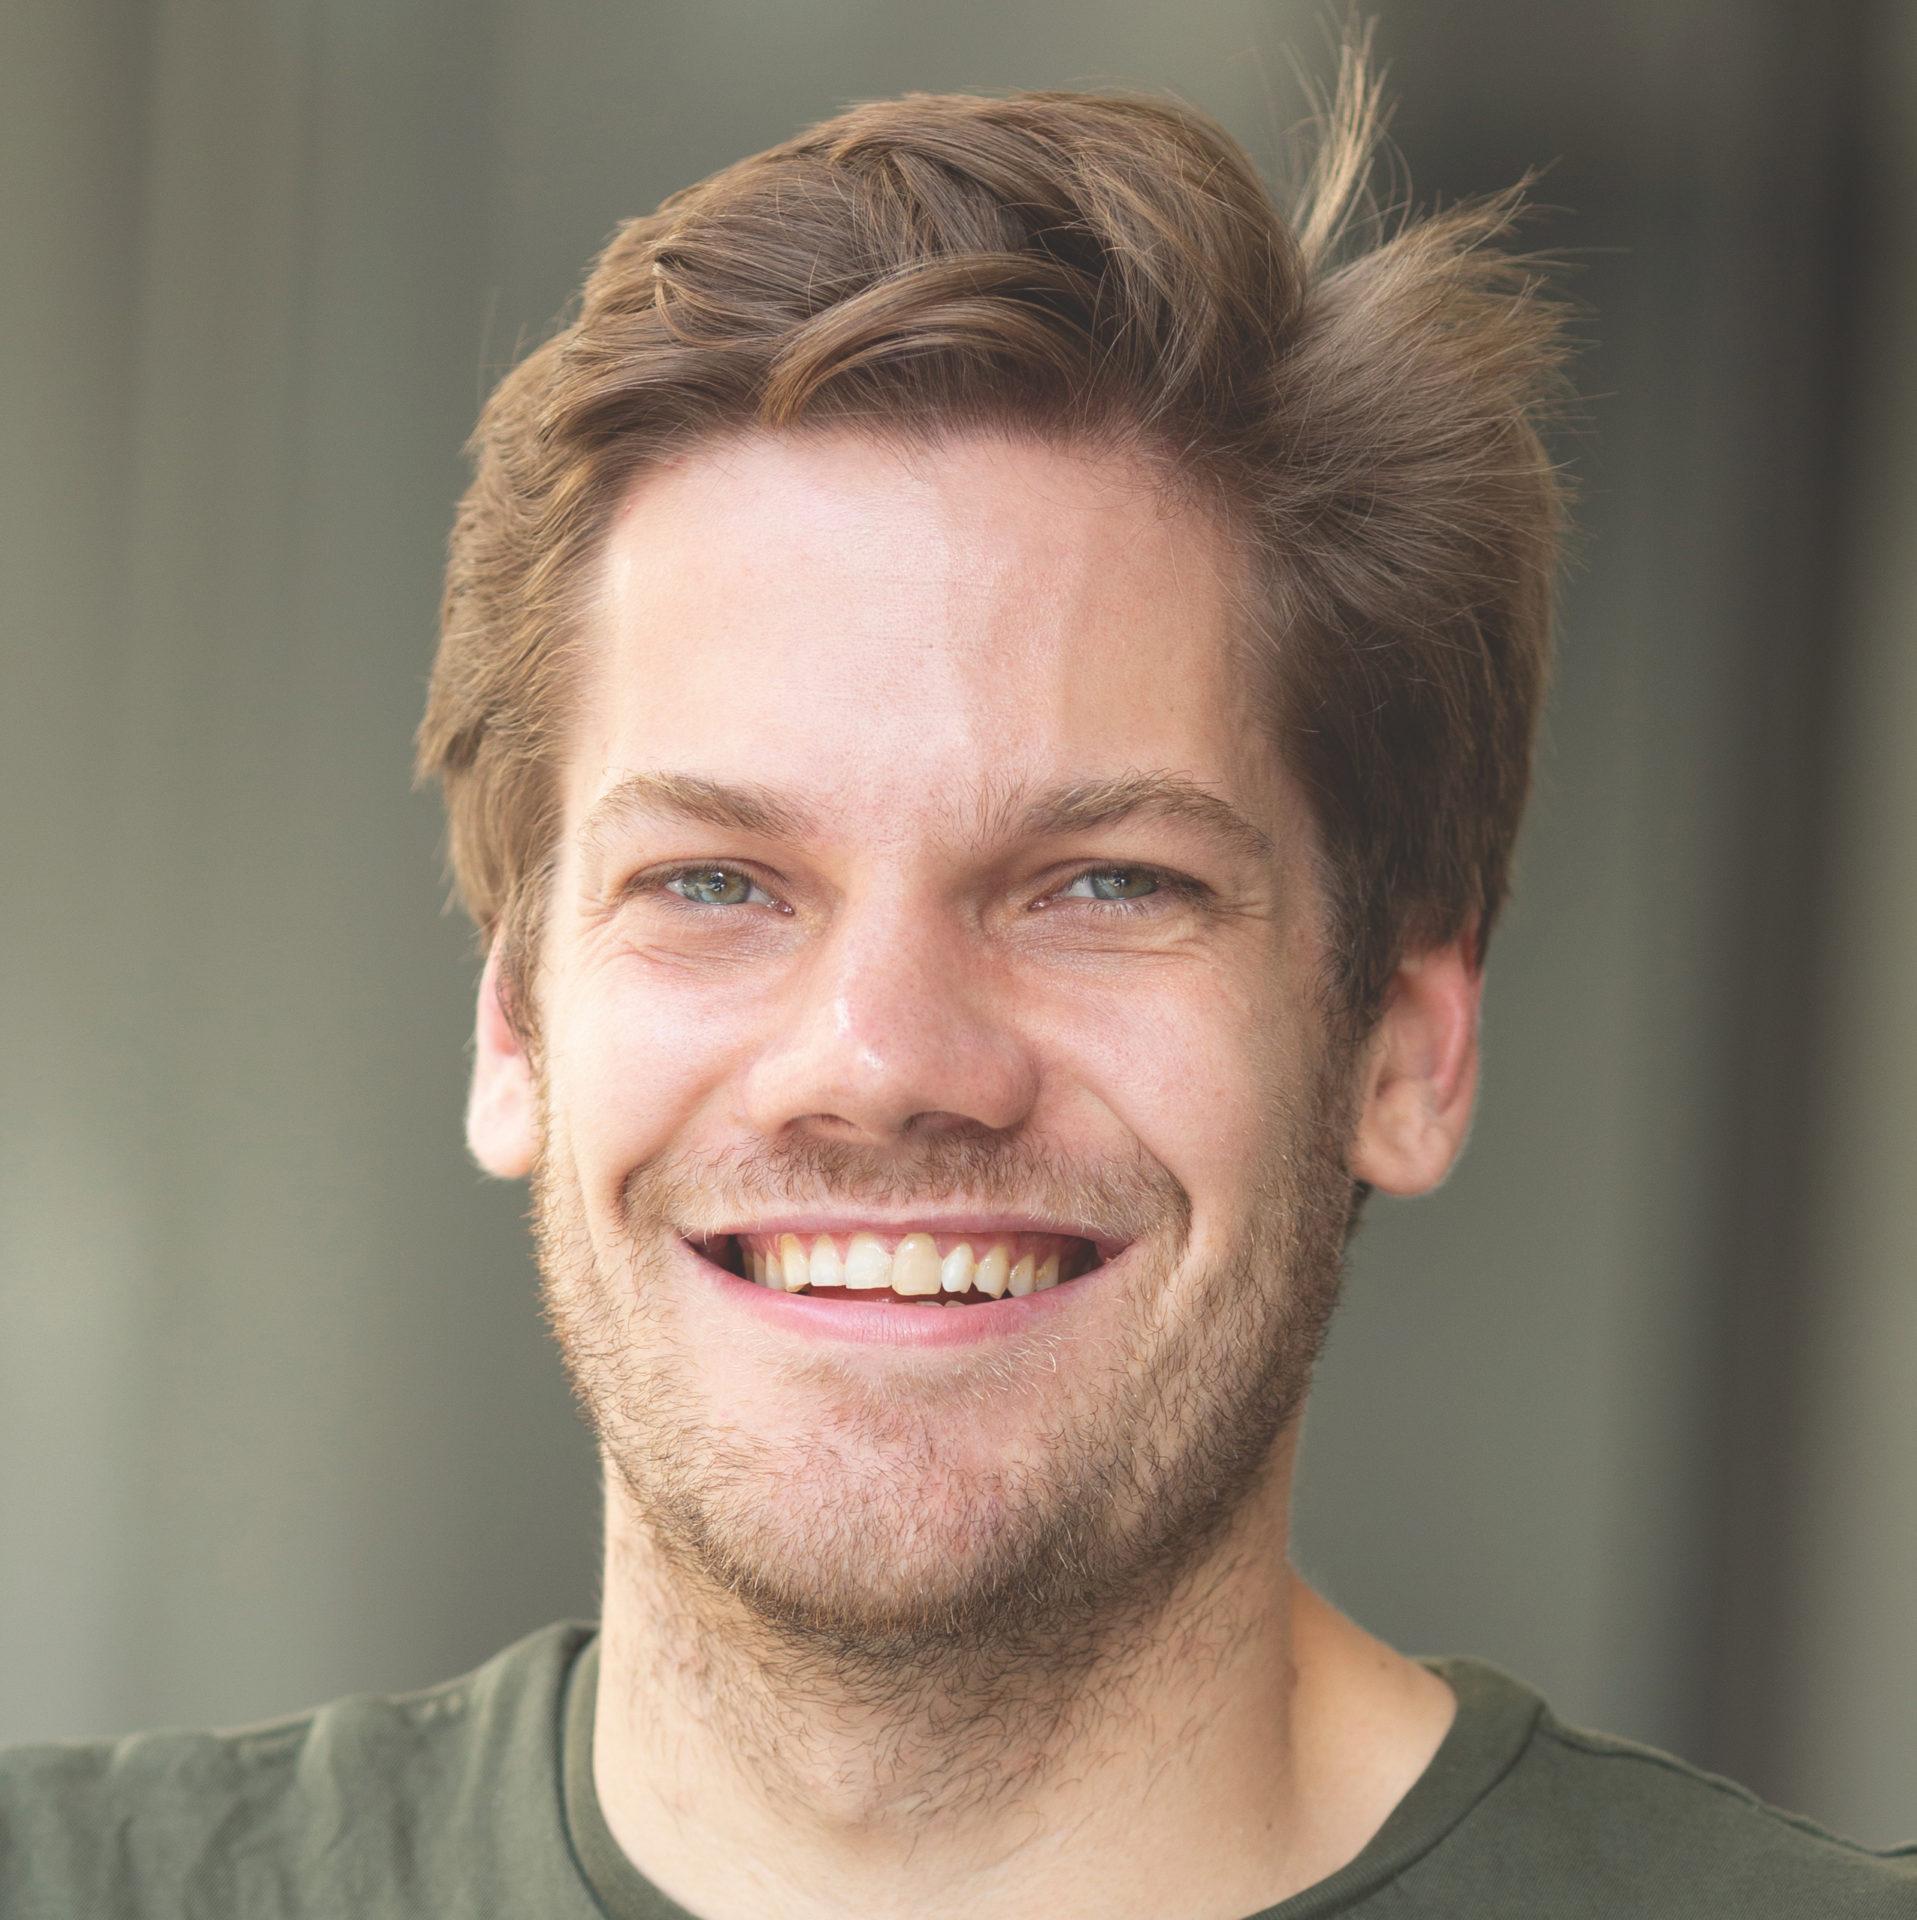 Felix Neufeld, CEO of AI specialist Disperse,